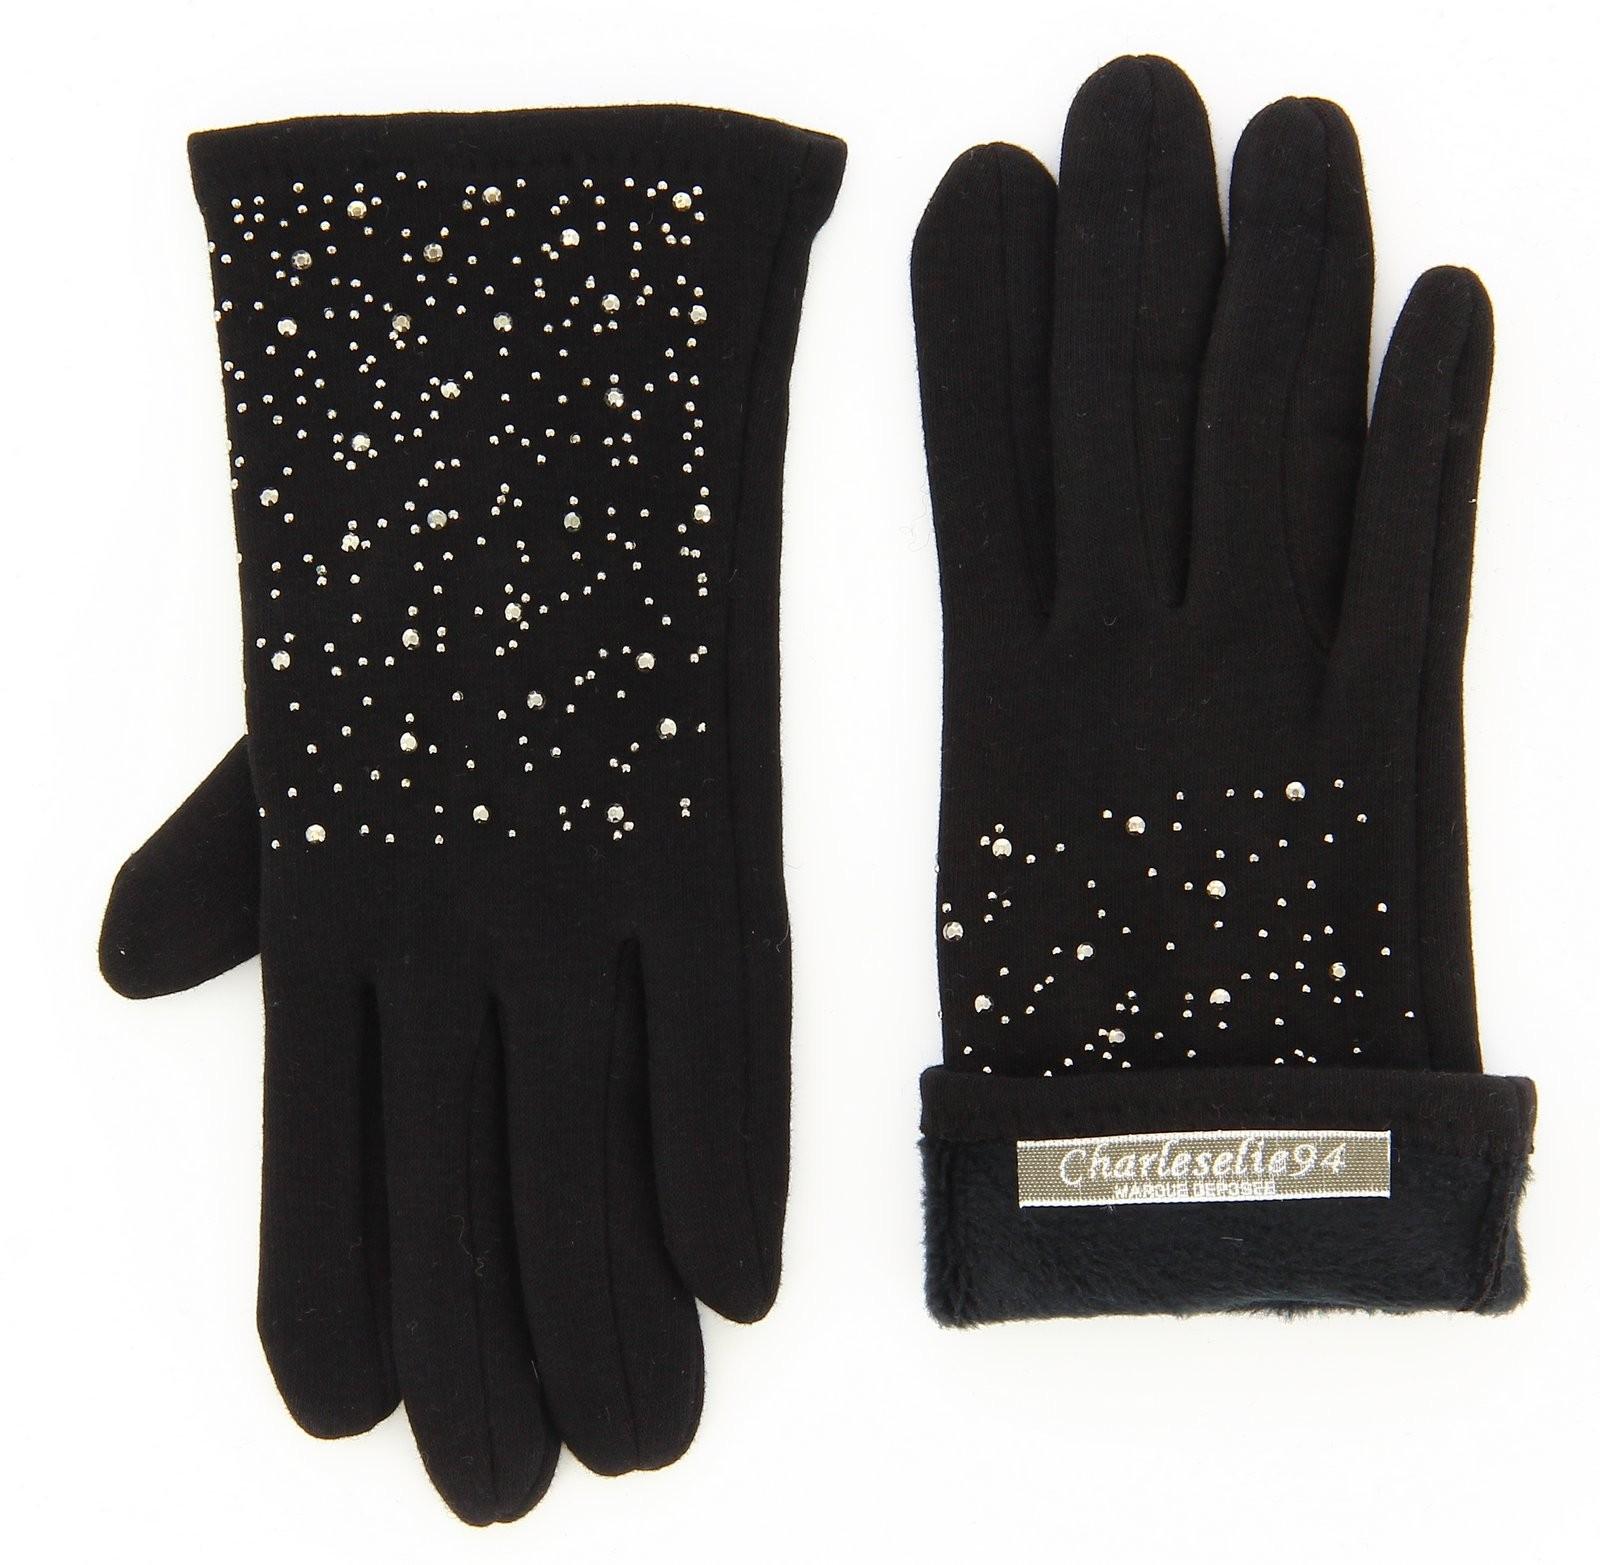 gants femme hiver polaire tactiles noir basile. Black Bedroom Furniture Sets. Home Design Ideas